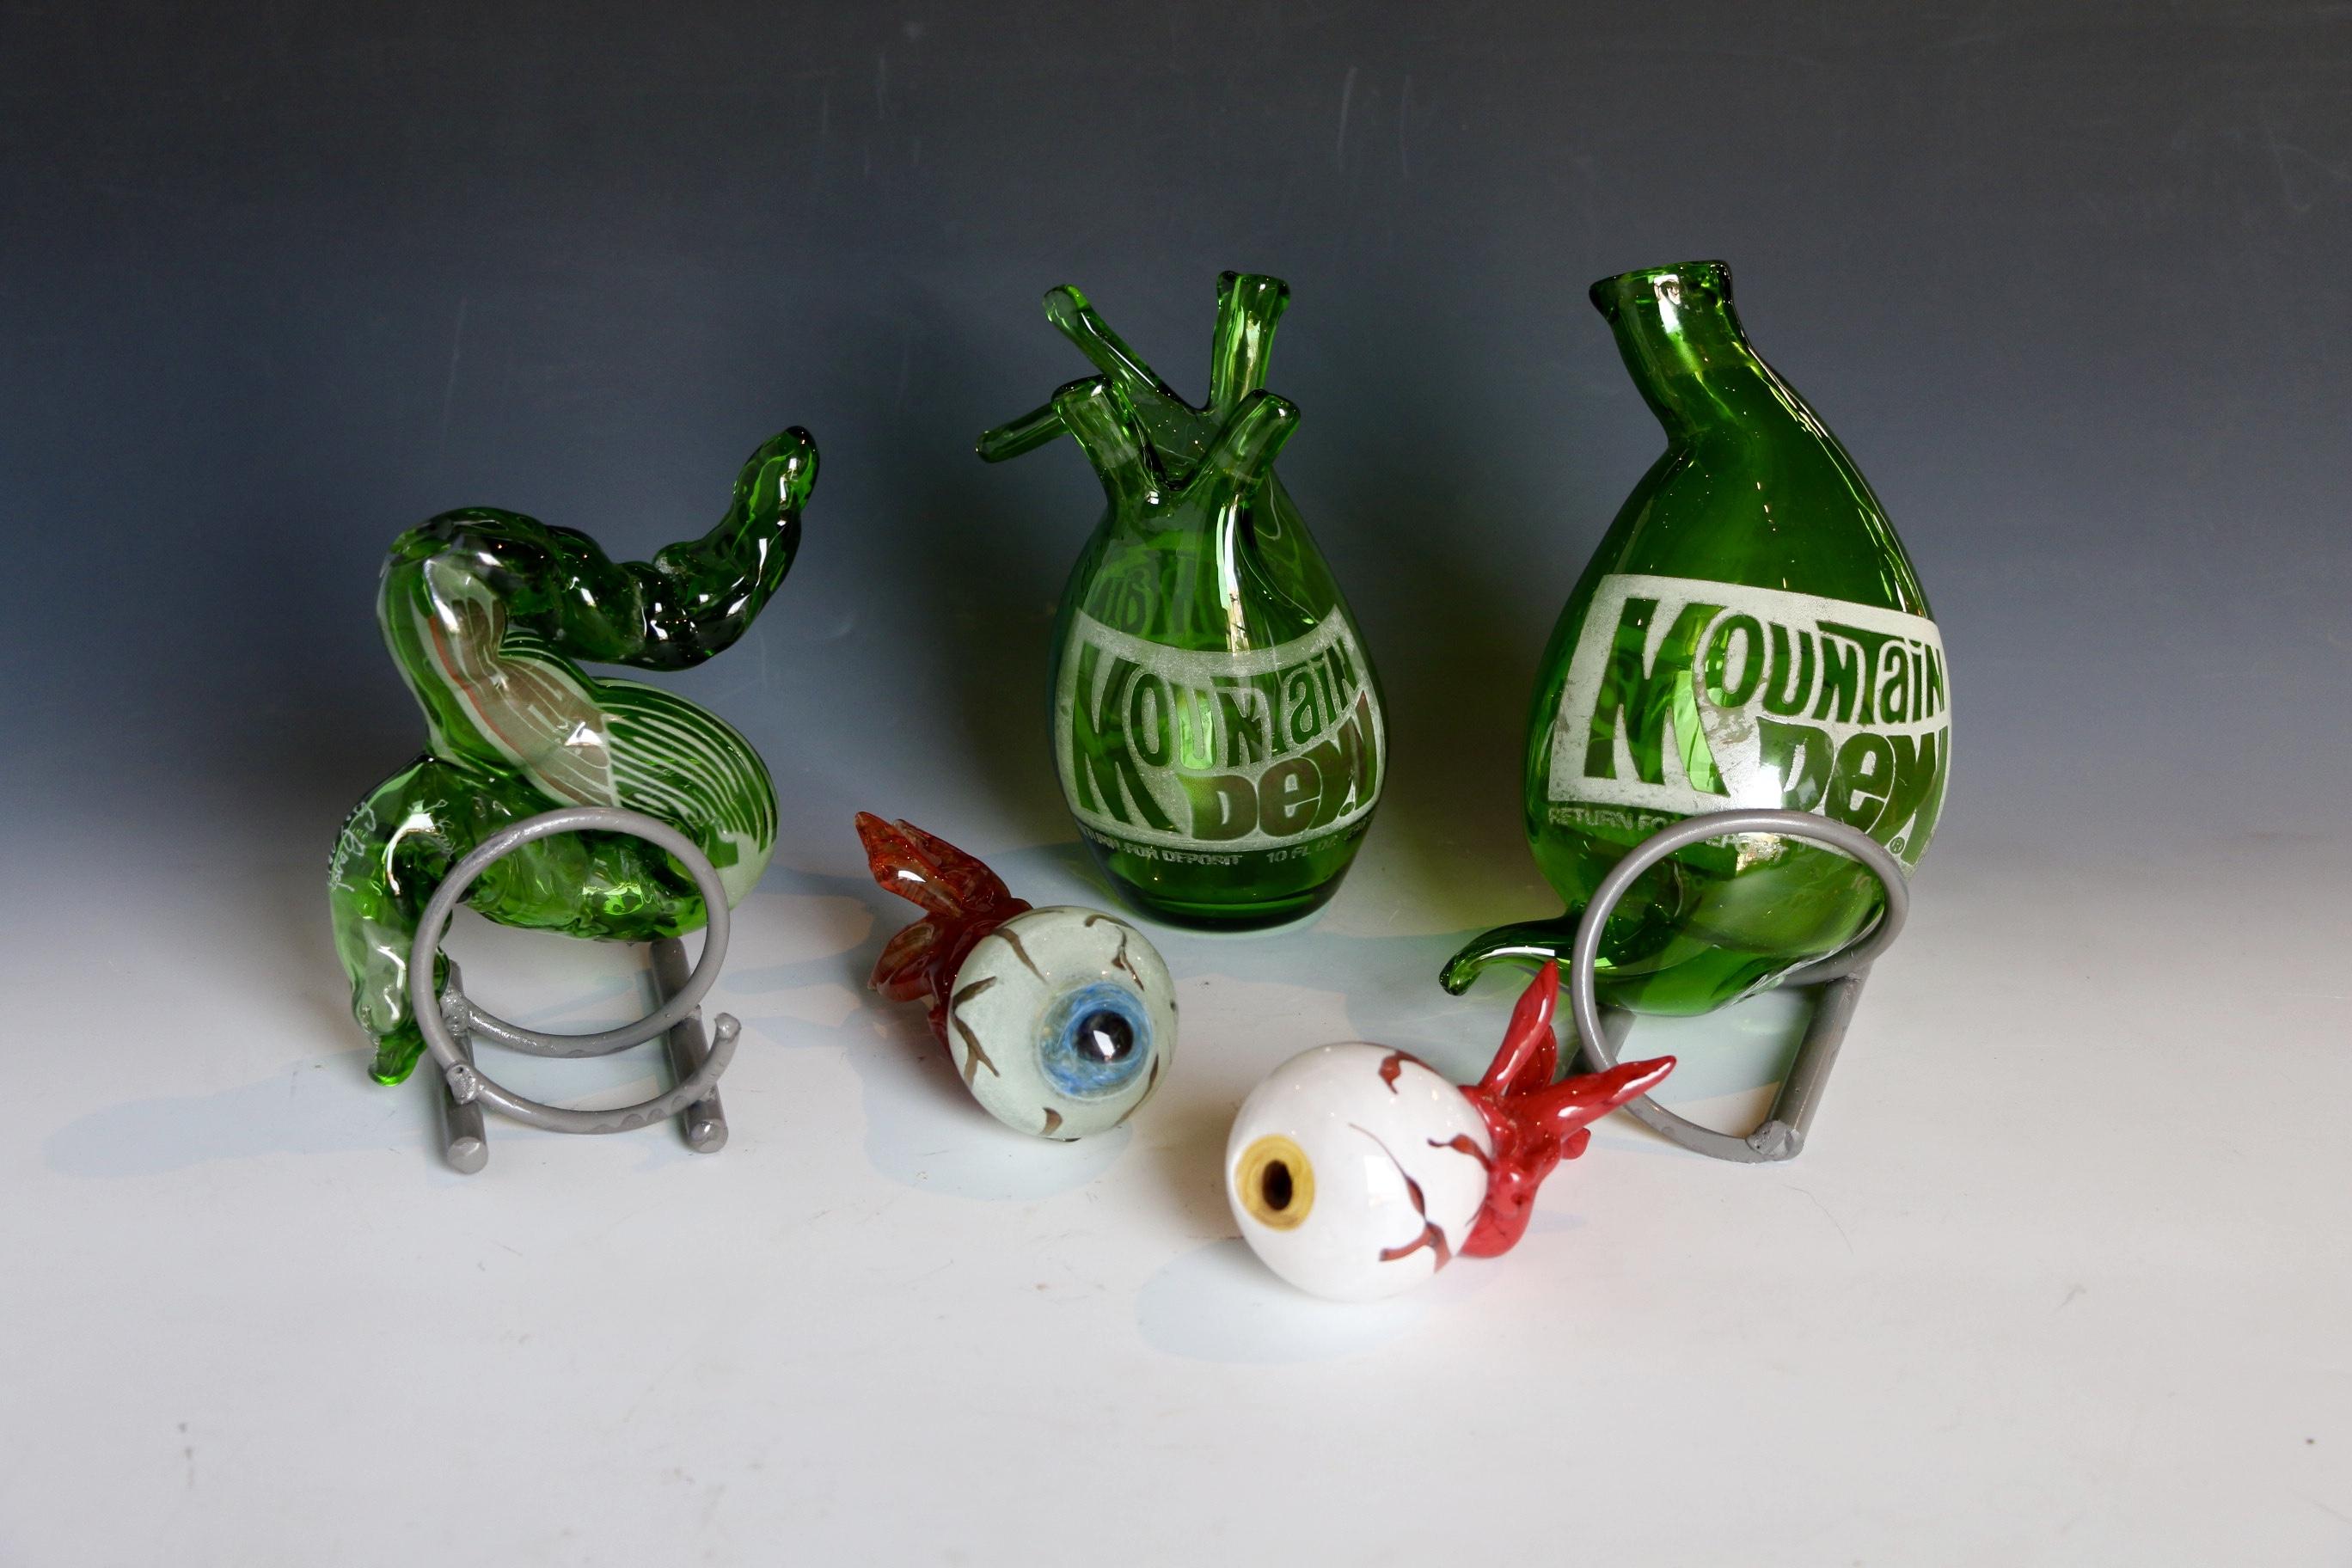 Antique soda bottles sculpted into organs